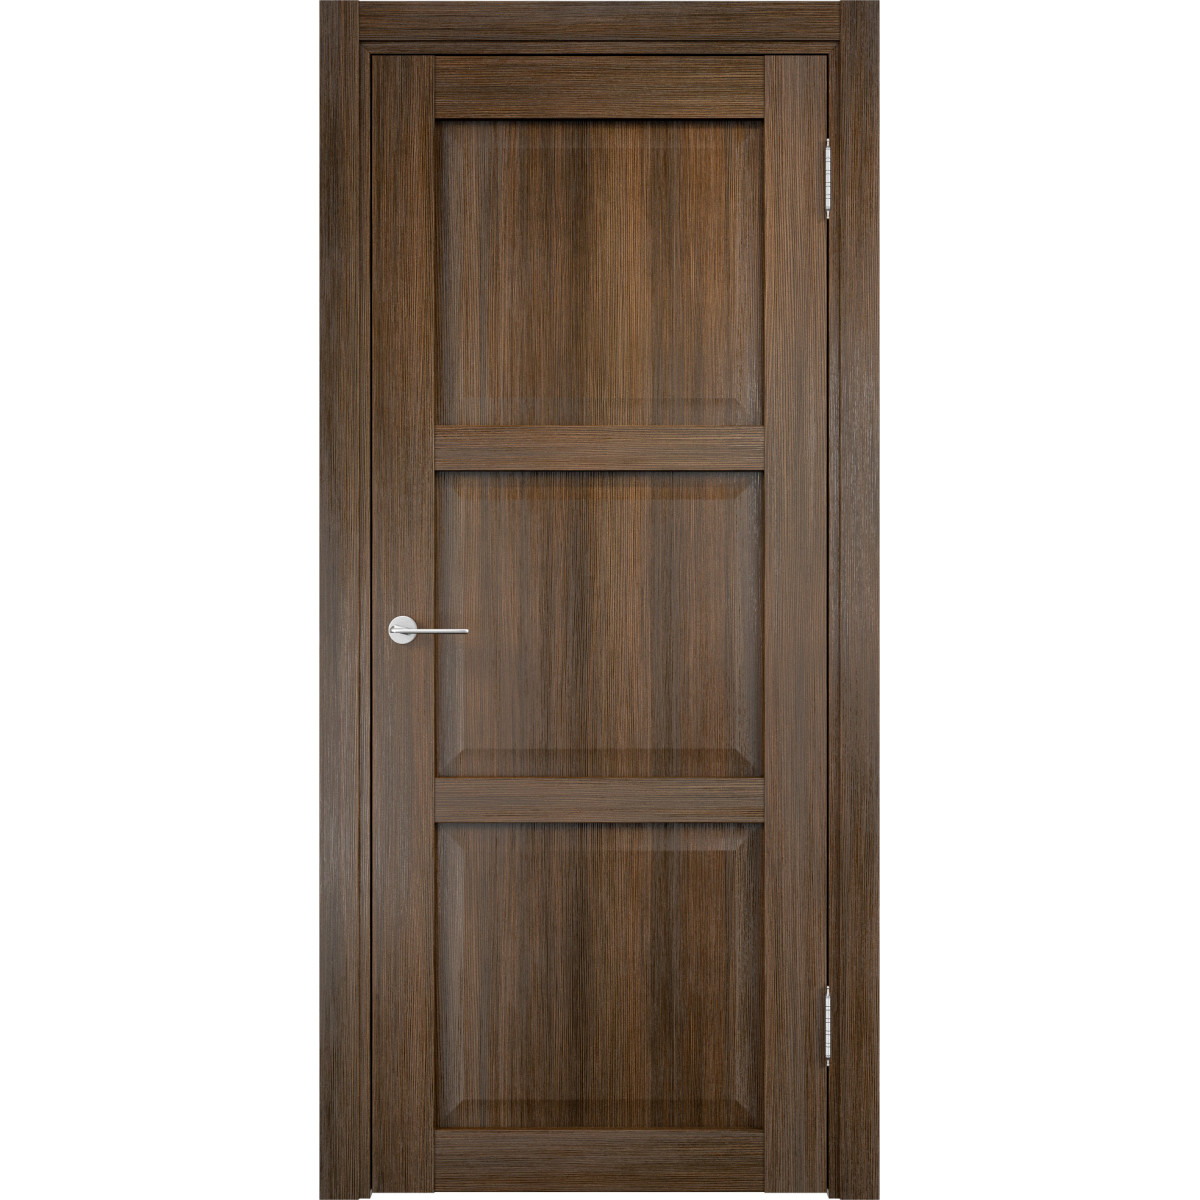 Дверное полотно Casaporte Рома МП_0108 2000х800х44 мм МДФ